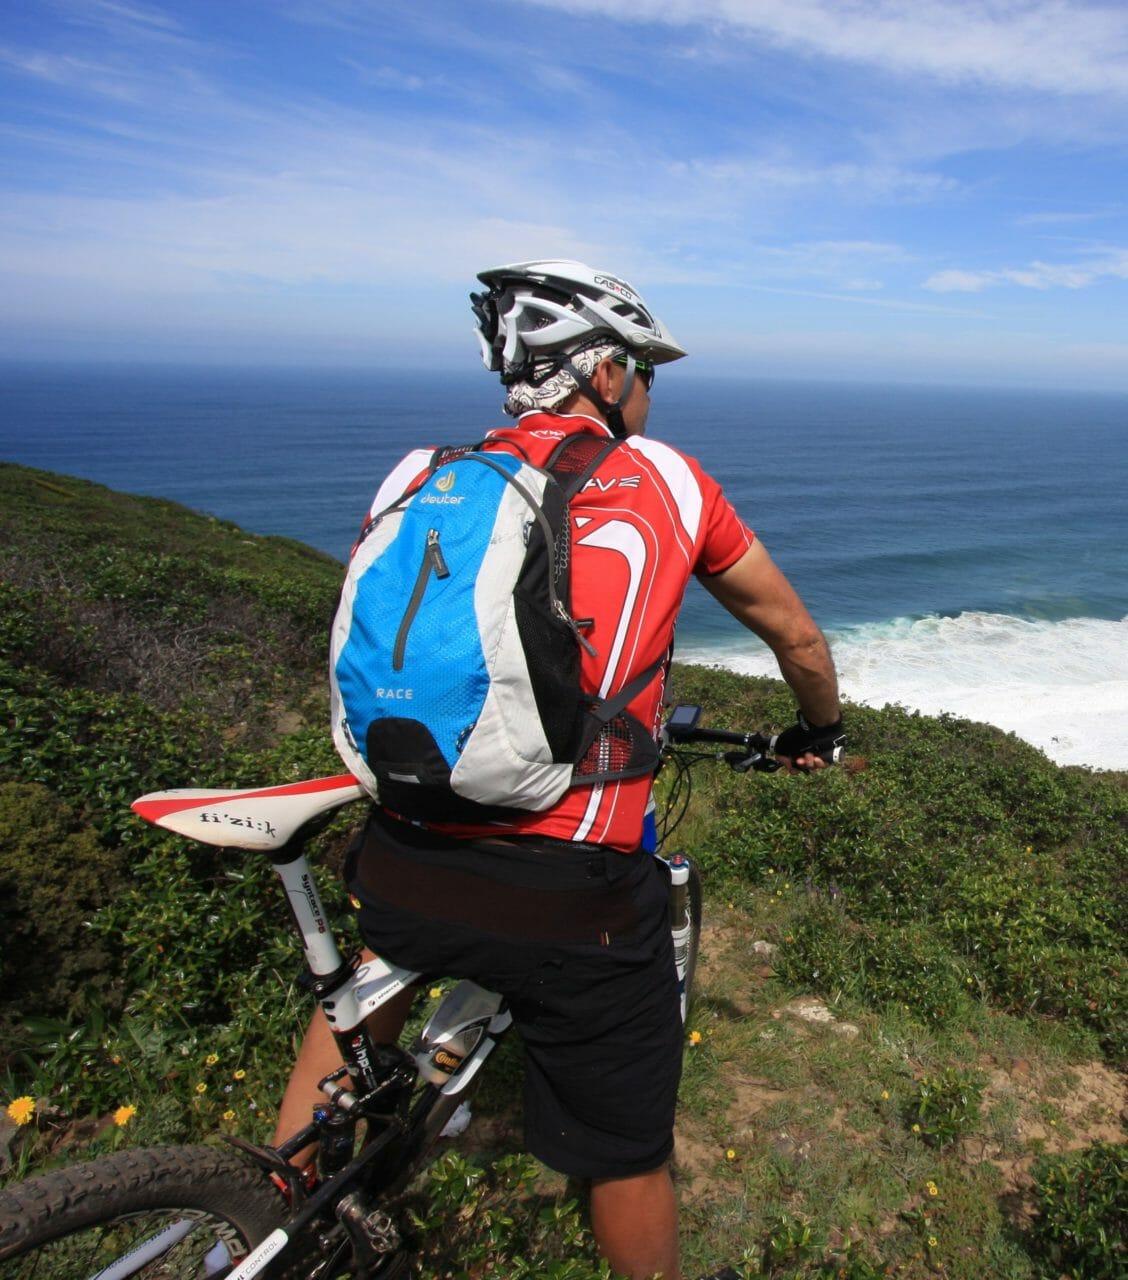 Bikepause mit Blick auf den Atlantik